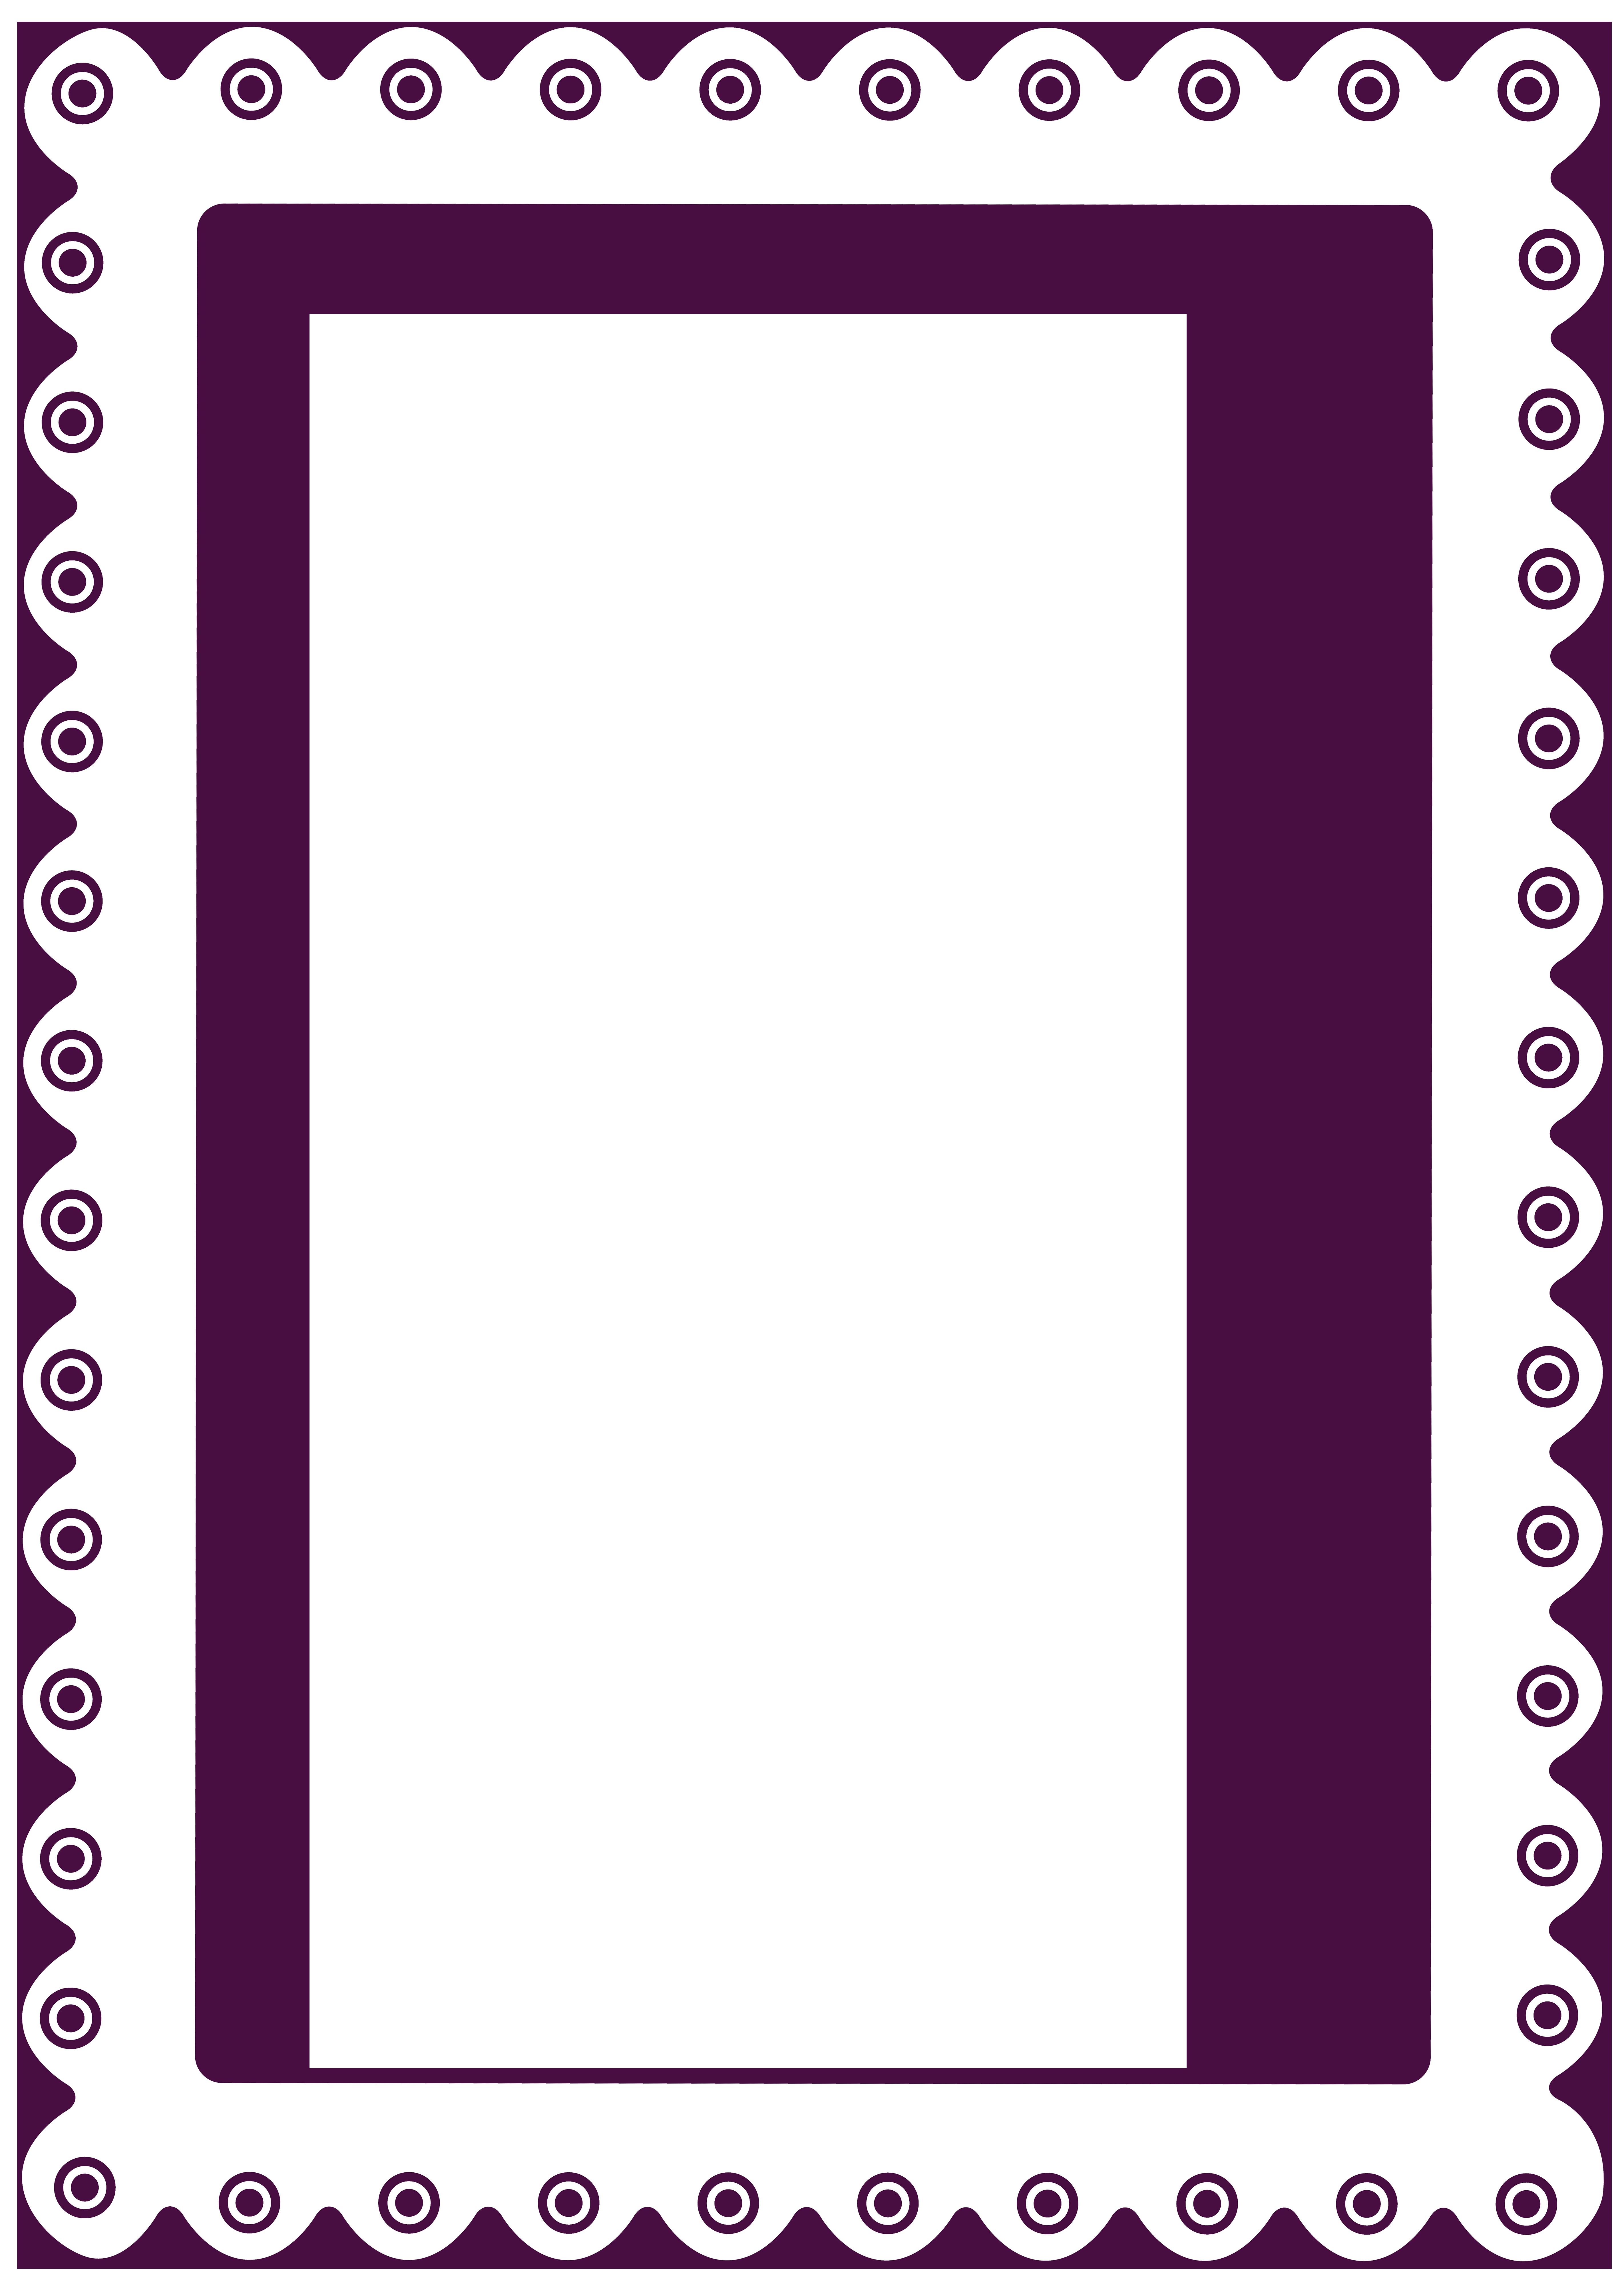 White square border png. Frame transparent clip art